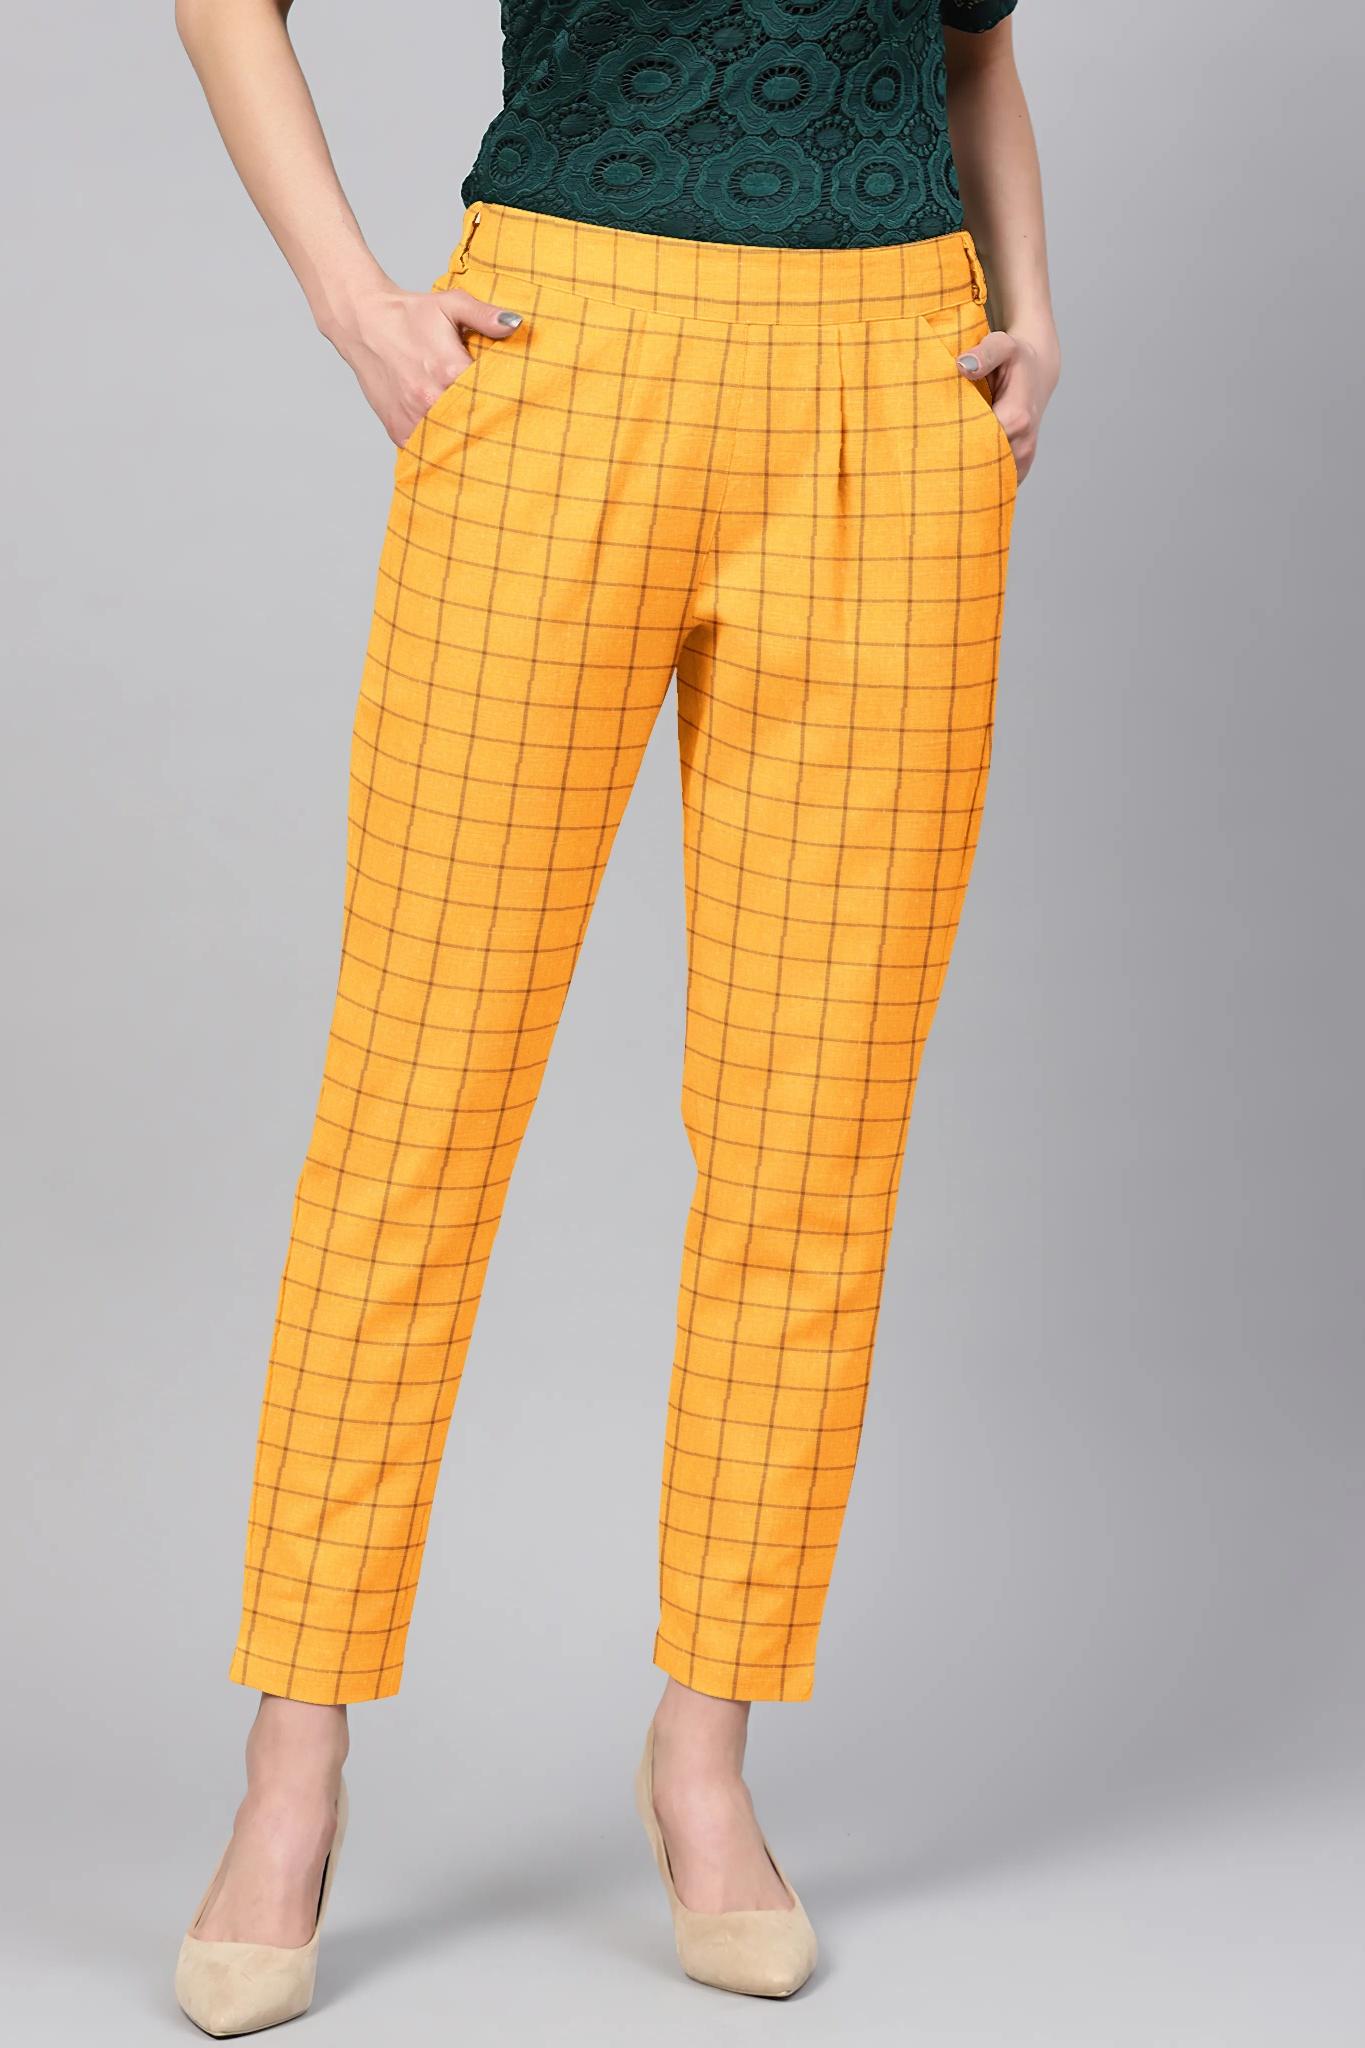 /home/customer/www/fabartcraft.com/public_html/uploadshttps://www.shopolics.com/uploads/images/medium/Yellow-Black-Cotton-Check-Regular-Fit-Solid-Trouser-36115.jpg